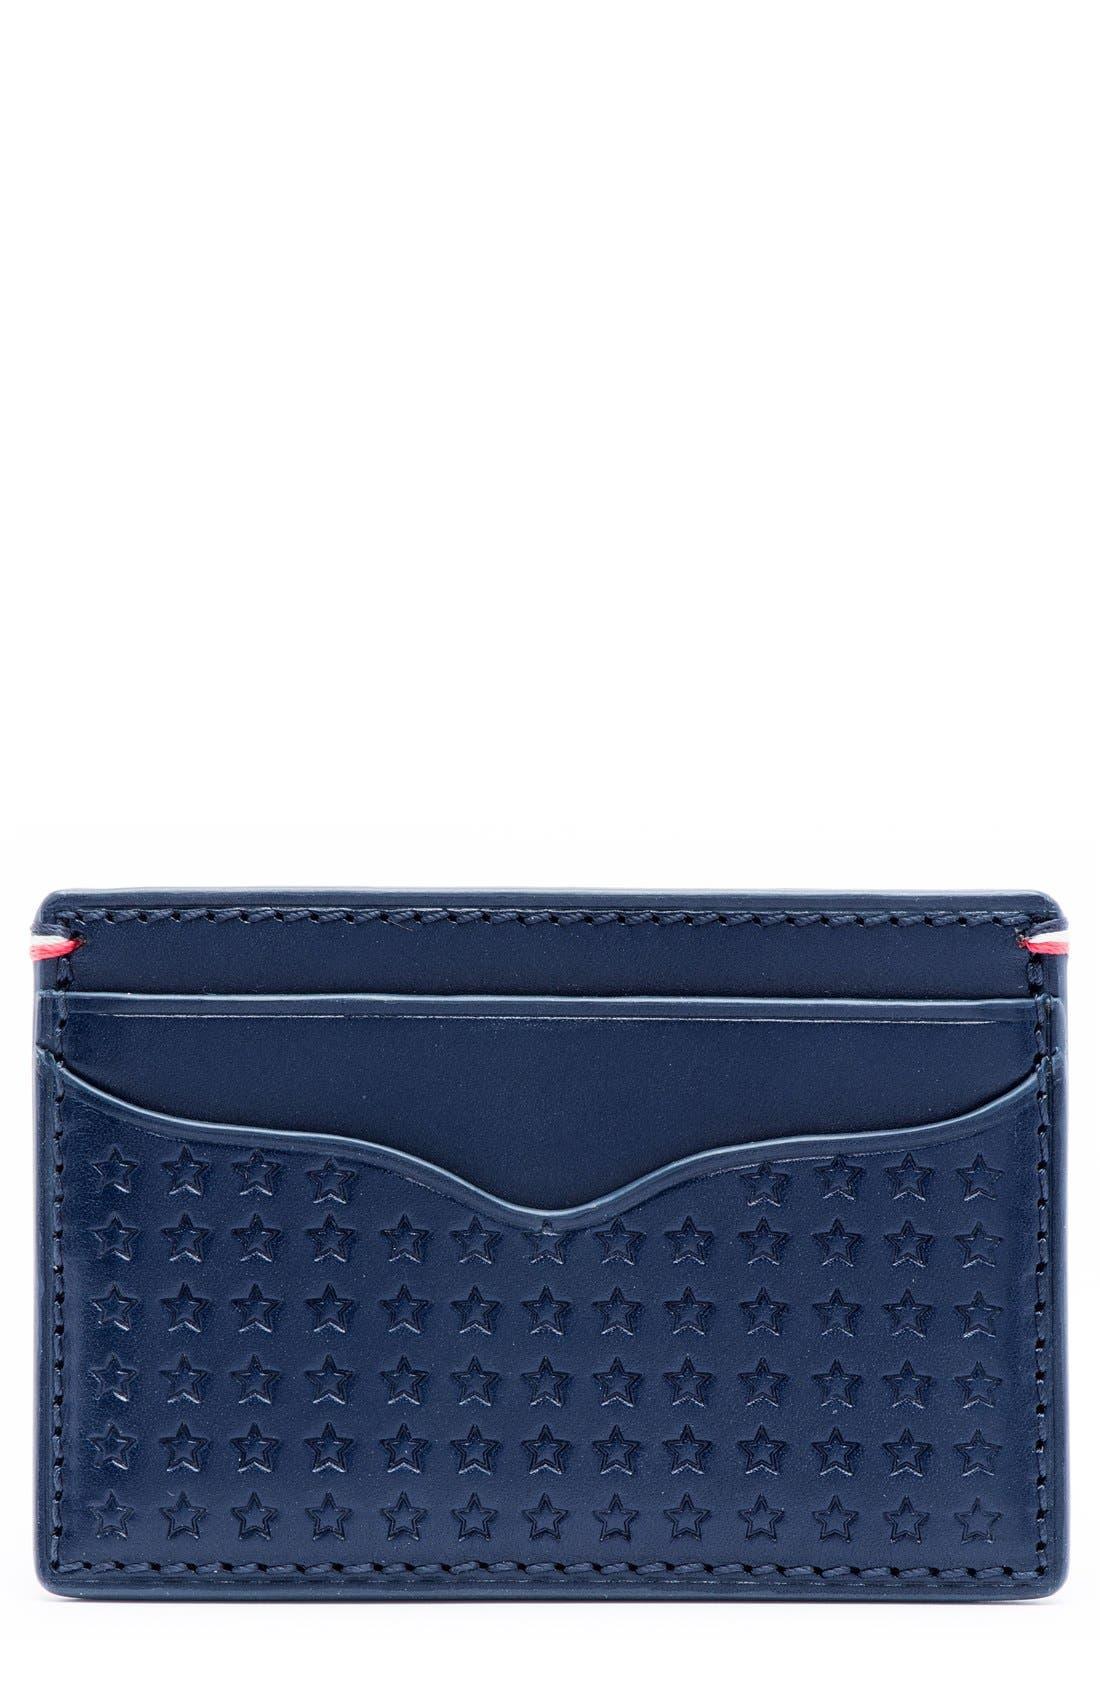 Jack Mason Star Leather Card Case